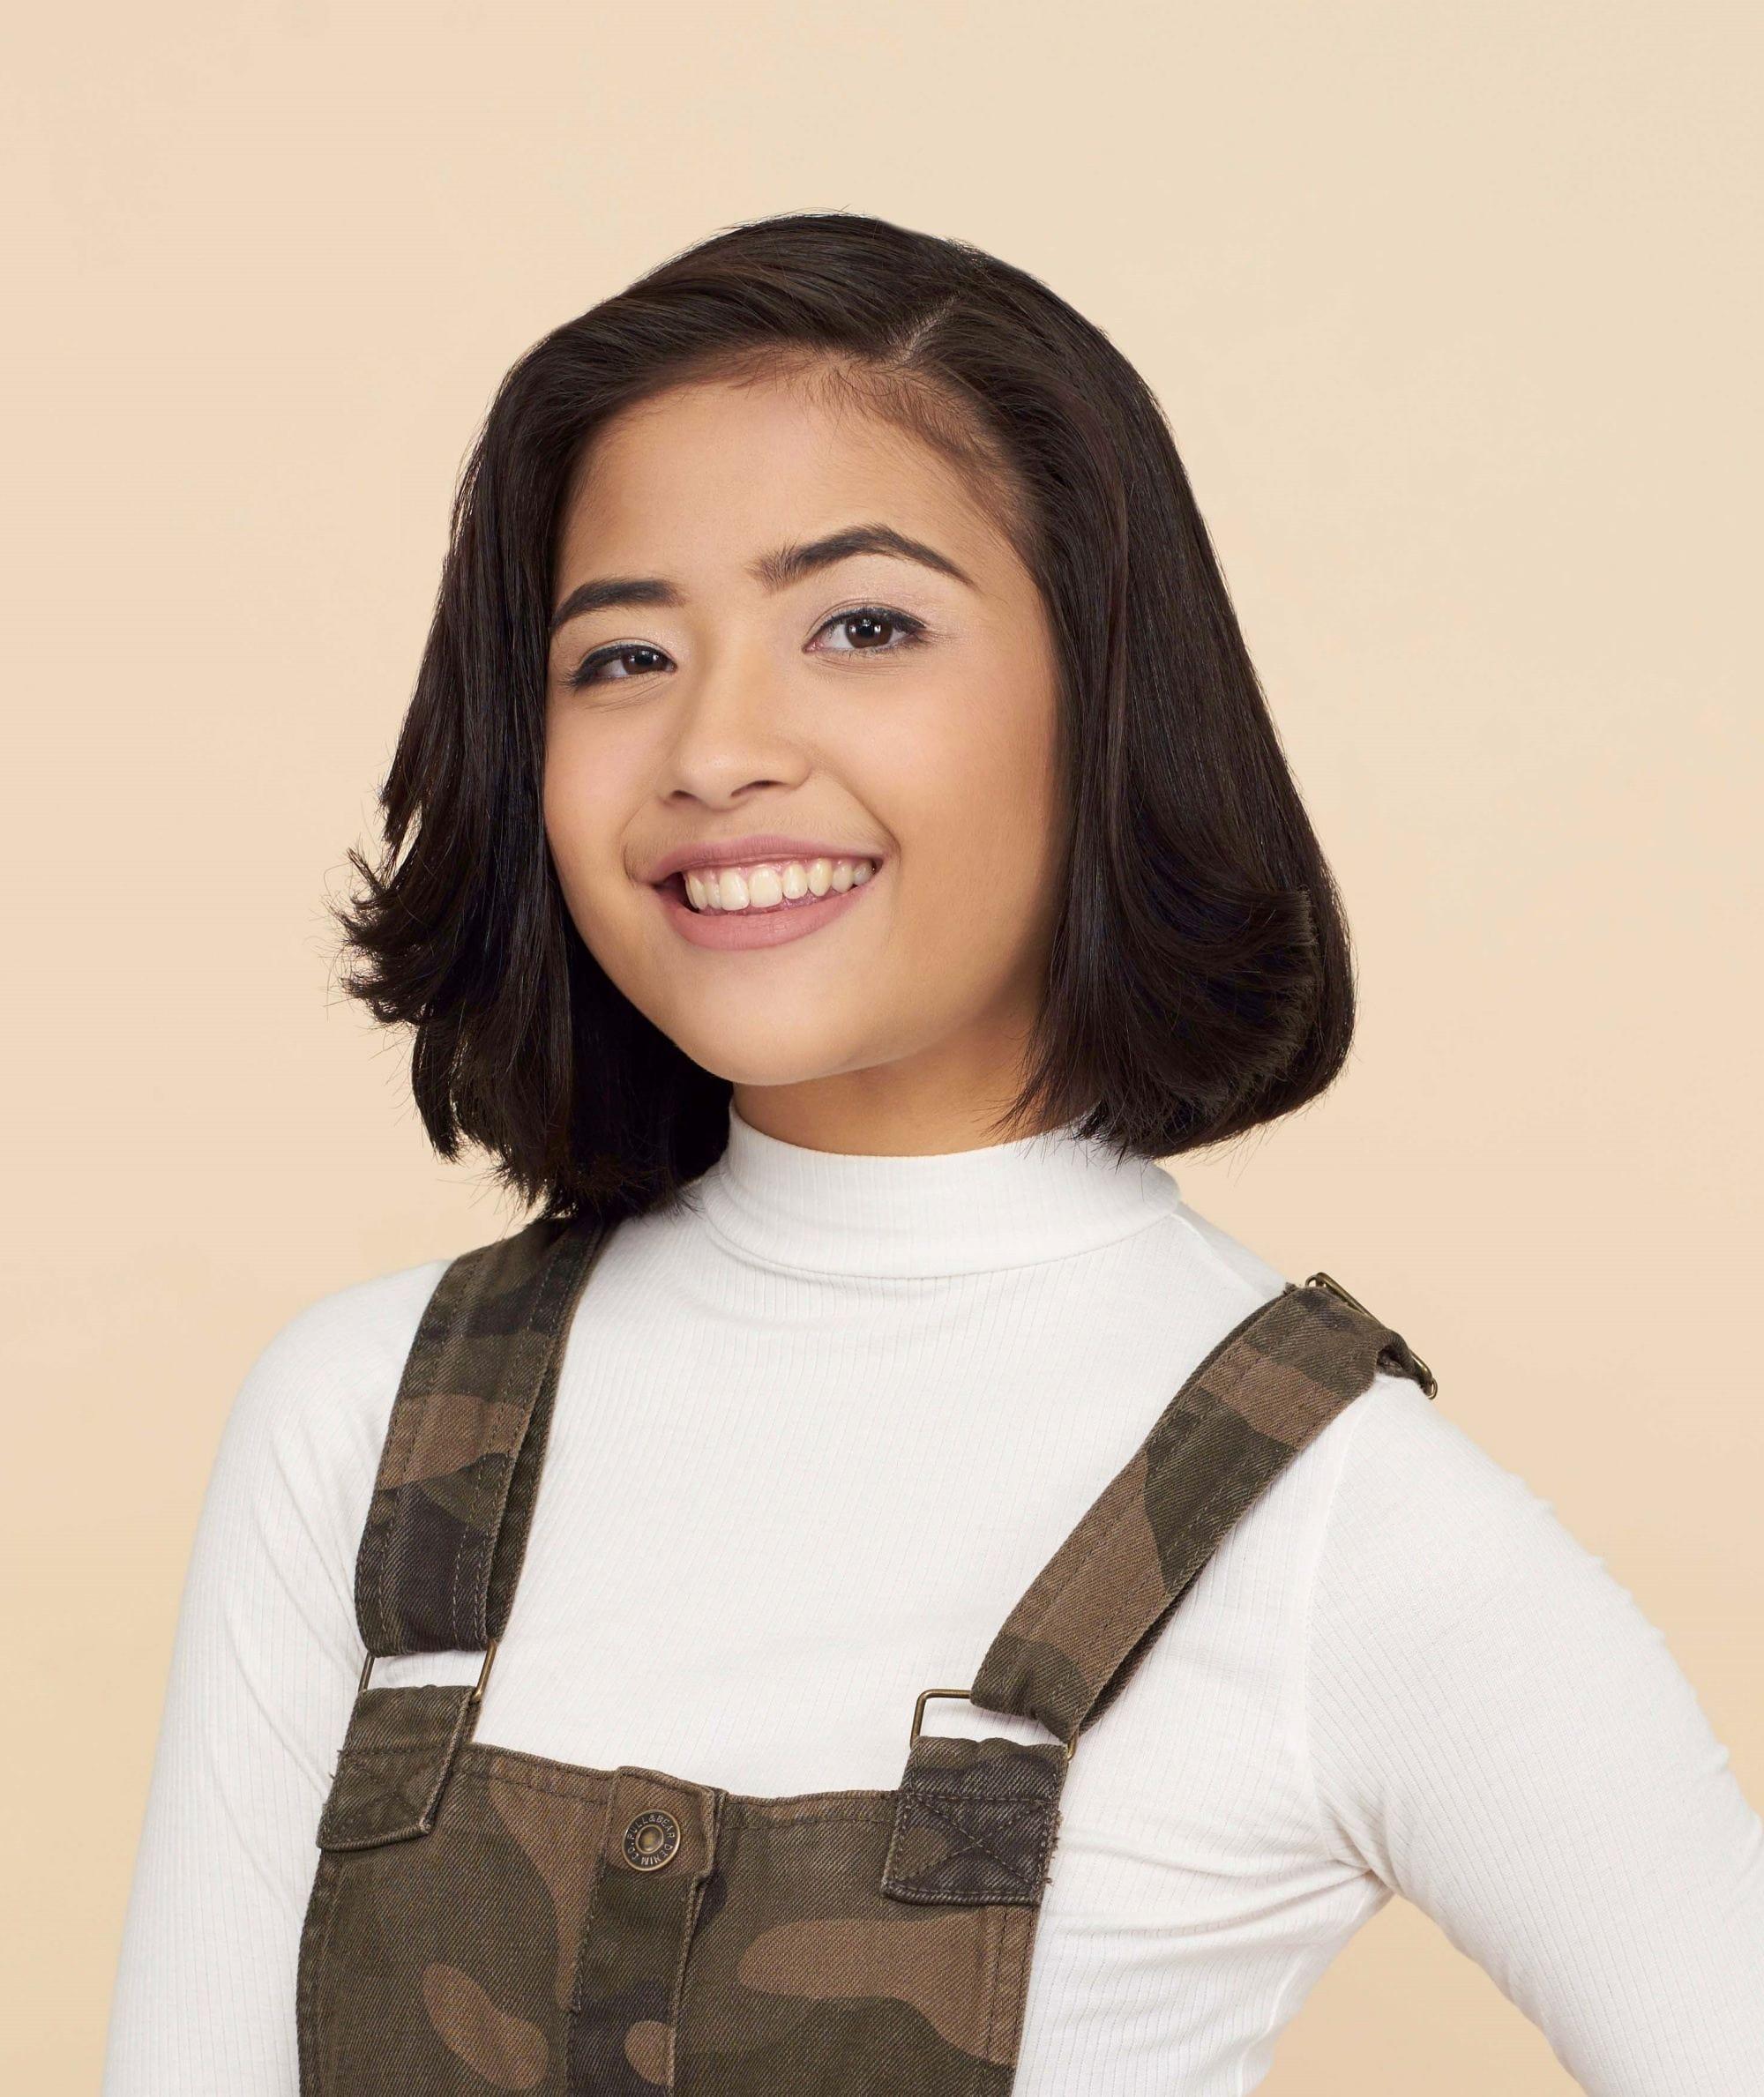 Small filipina girl